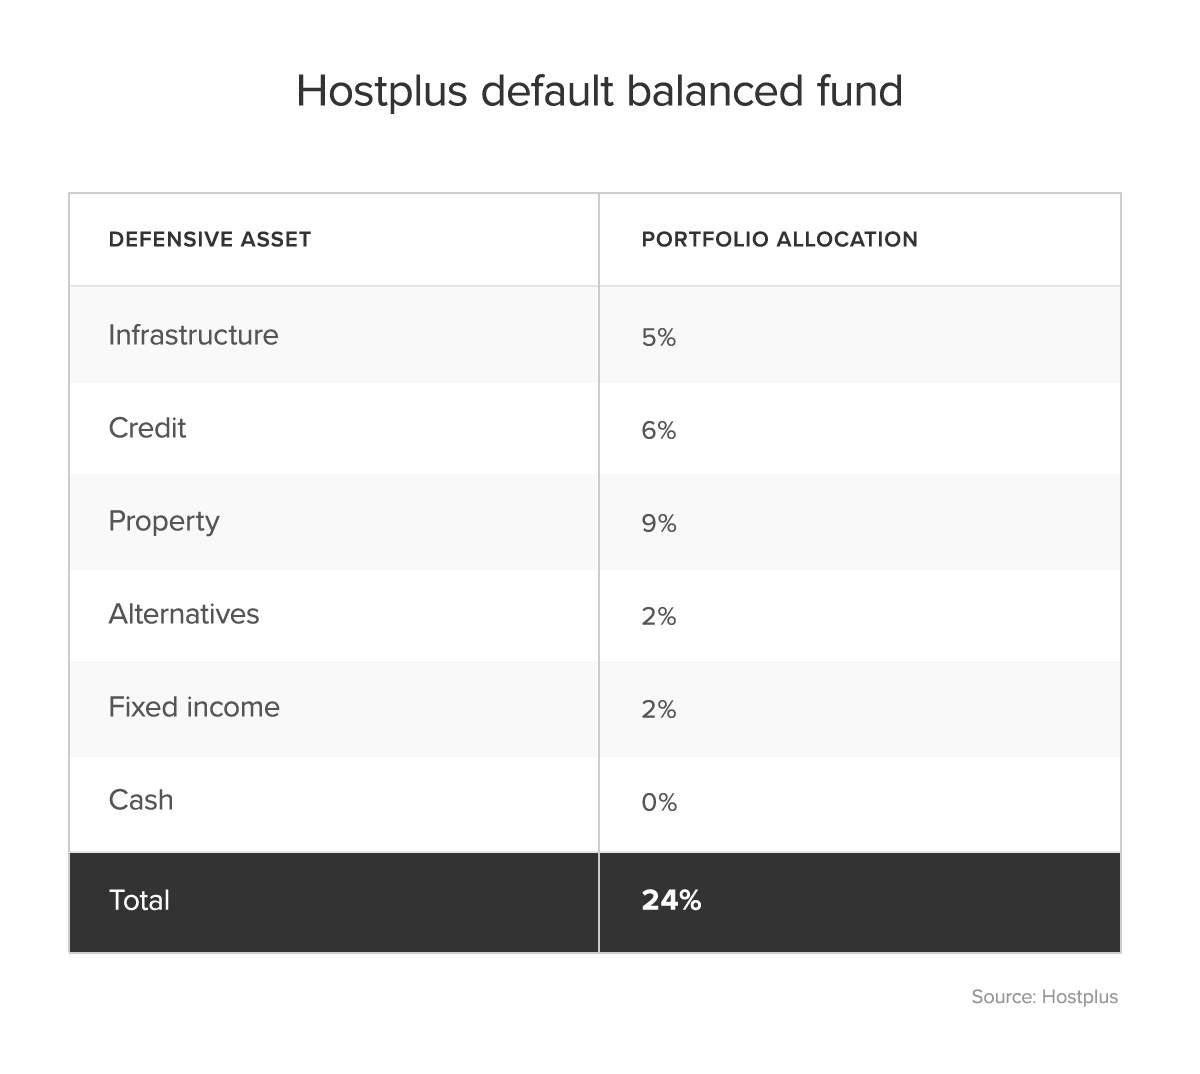 Defensive asset and portfolio allocation